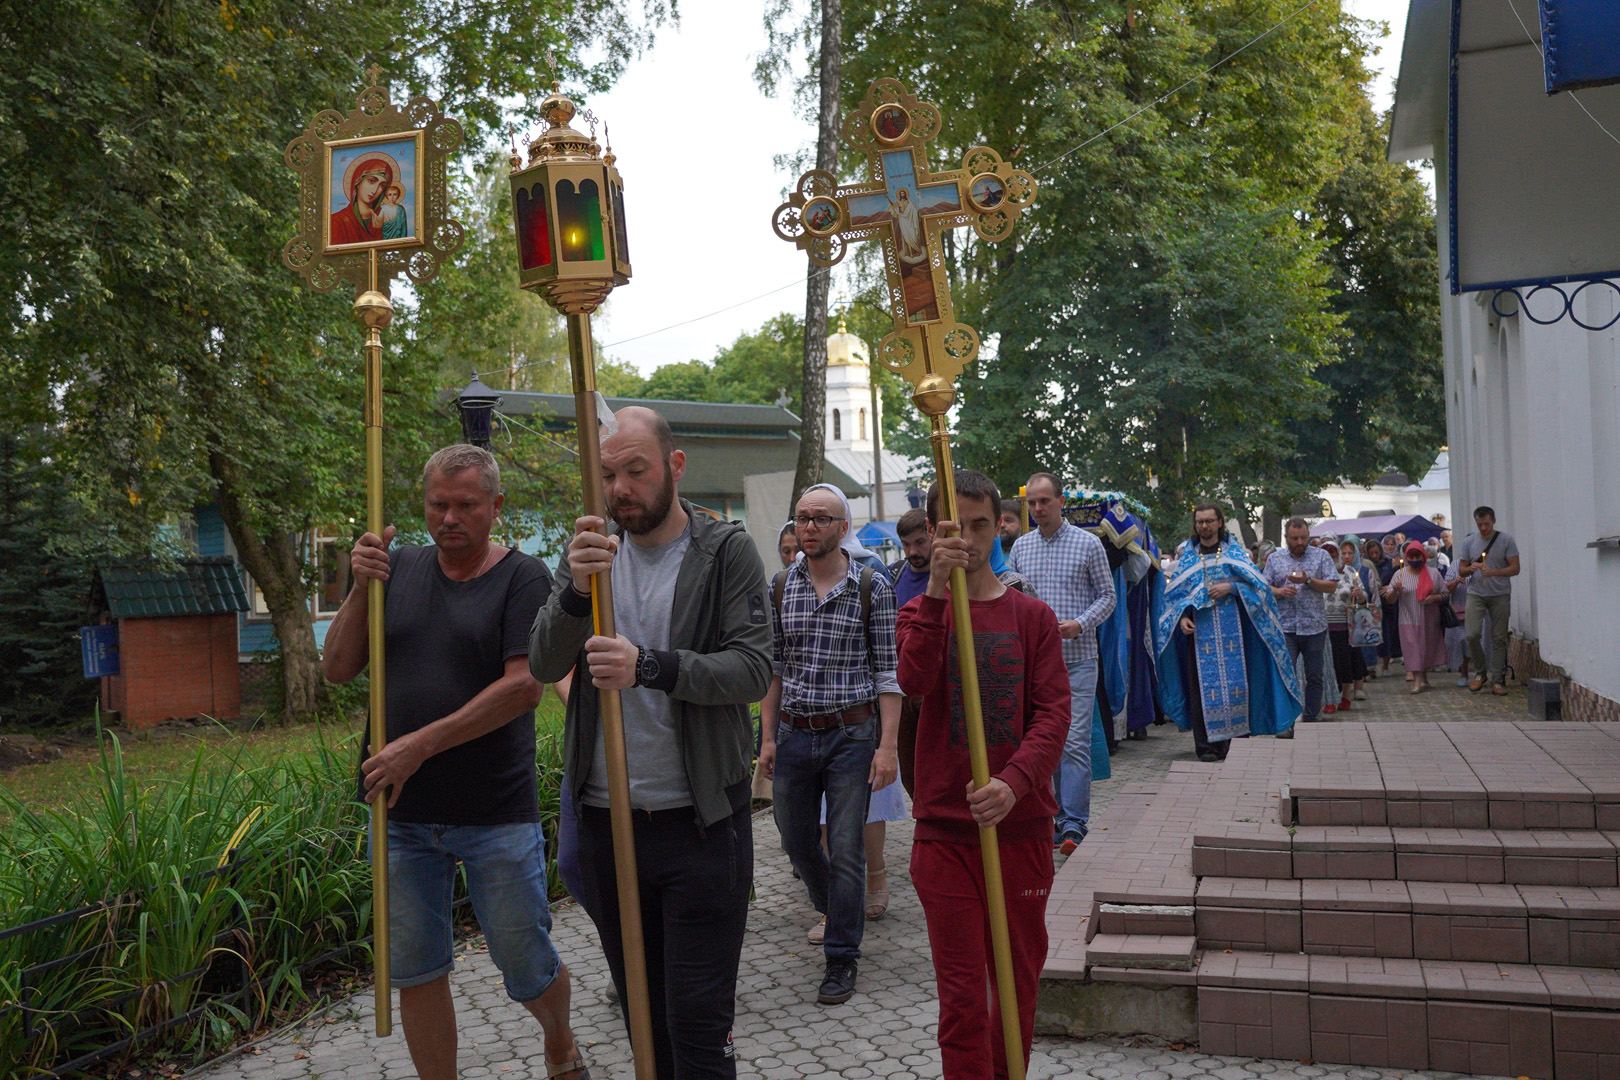 http://monuspen.ru/photoreports/eb9de00e1f5615849ea00b127bfcb99a.jpg